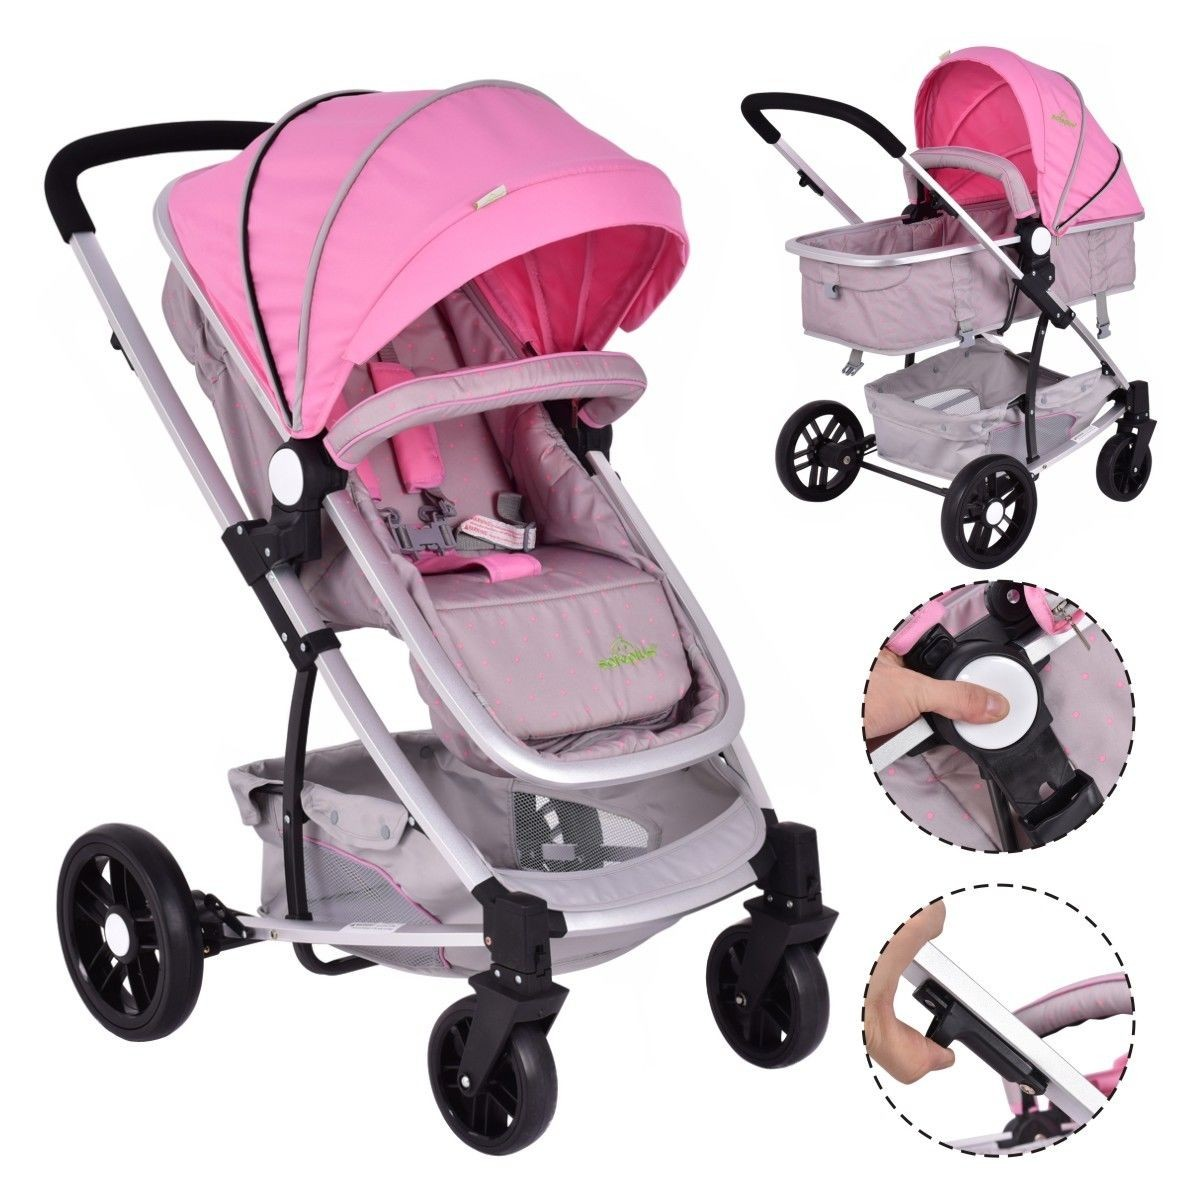 2 In1 Foldable Baby Stroller Kids Travel Newborn Infant